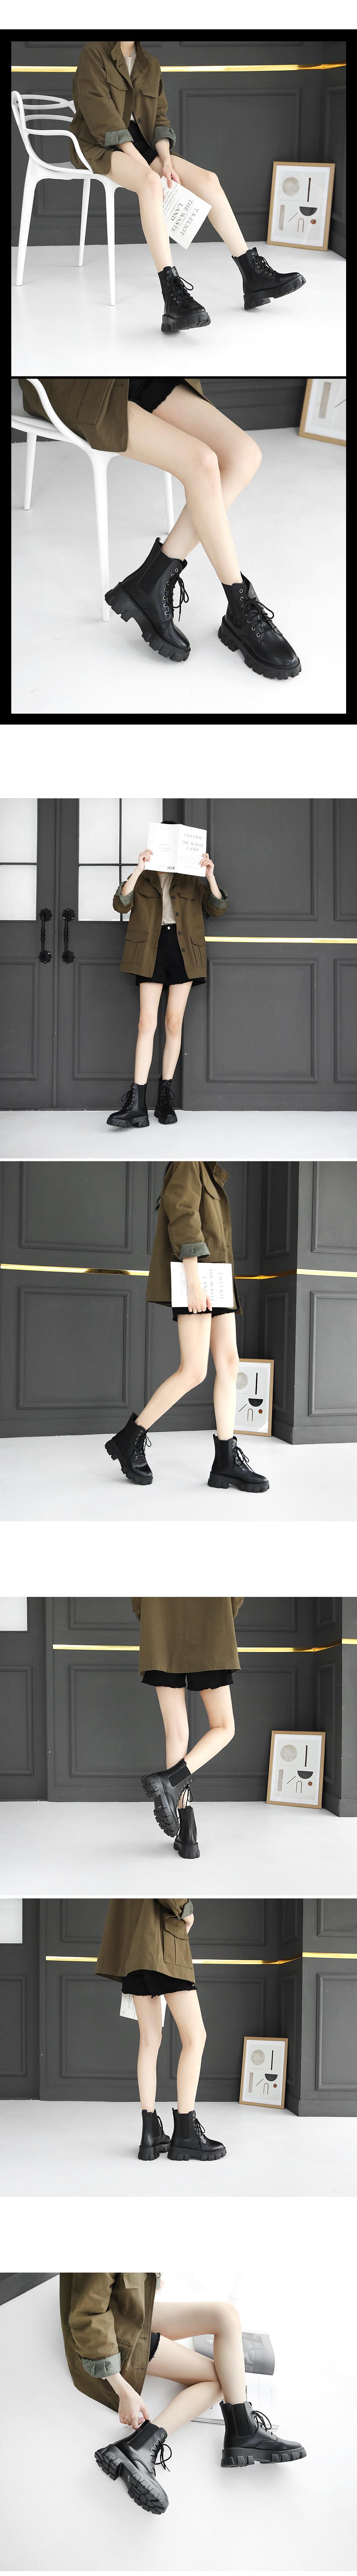 Semik Chelsea Walker 5cm